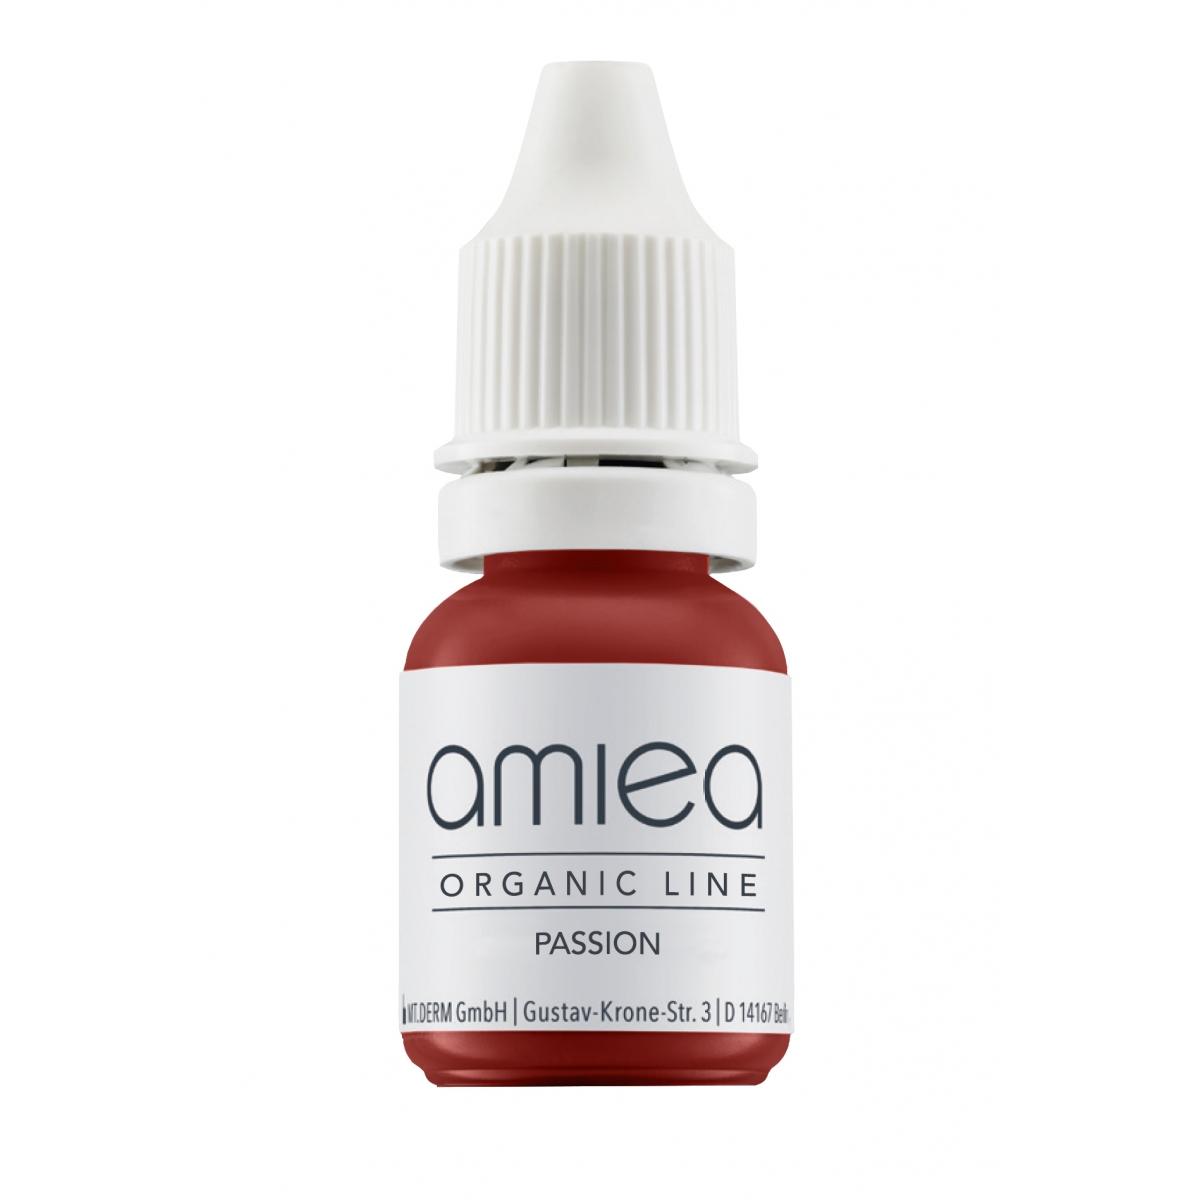 ORGANIC LINE (5ml)  - PIGMENT PASSION ORGANICLINE AMIEA (5 ml)